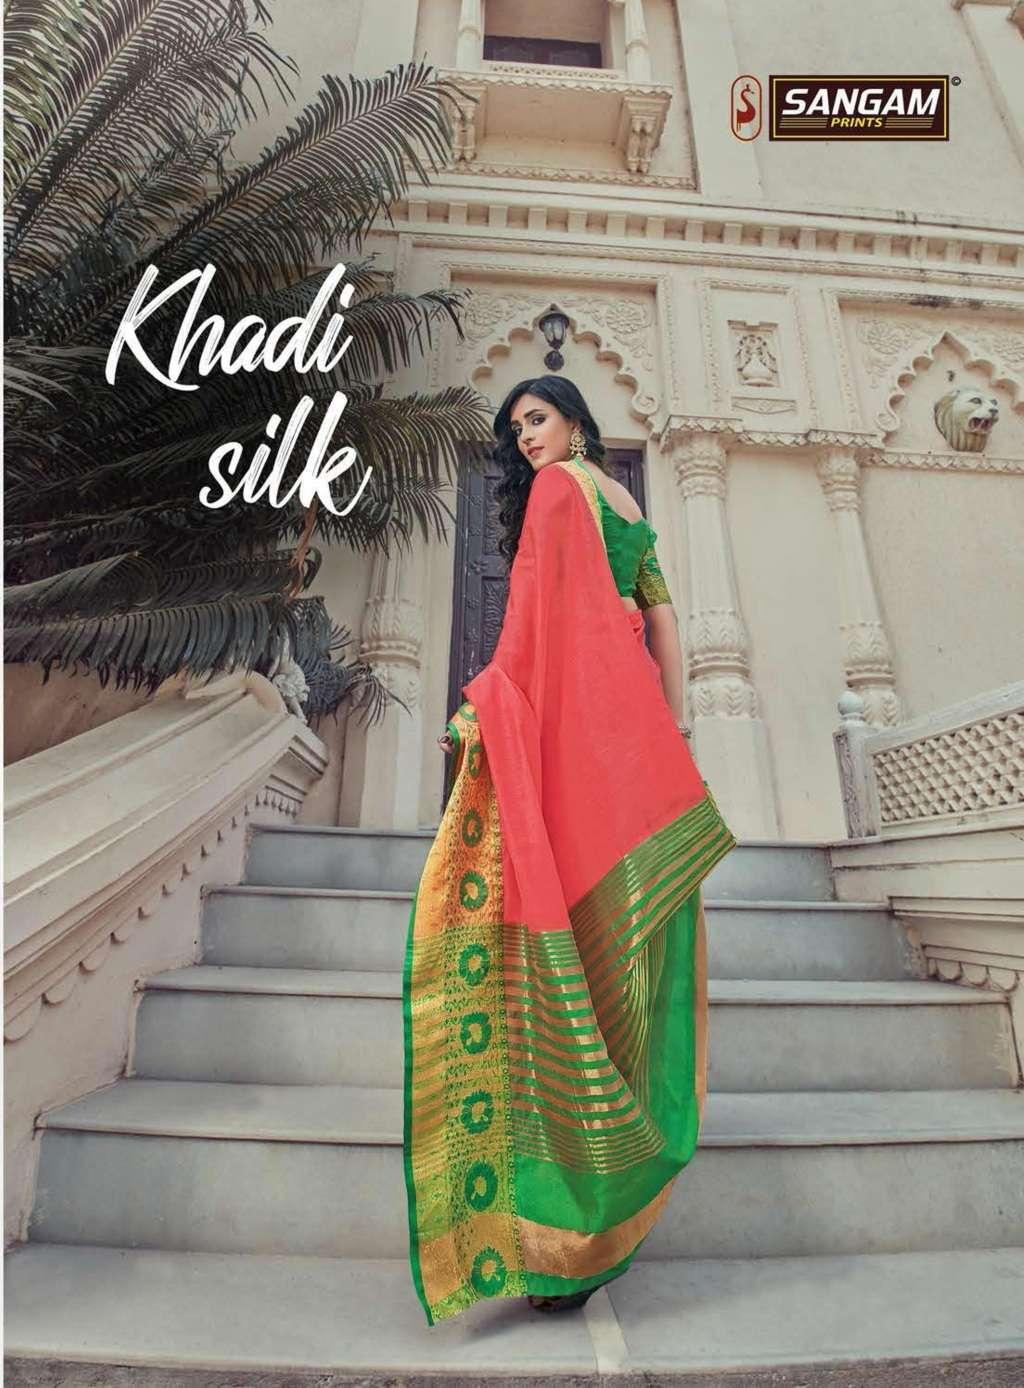 sangam prints kadi silk vol-7 cotton handloom saris wholesaler